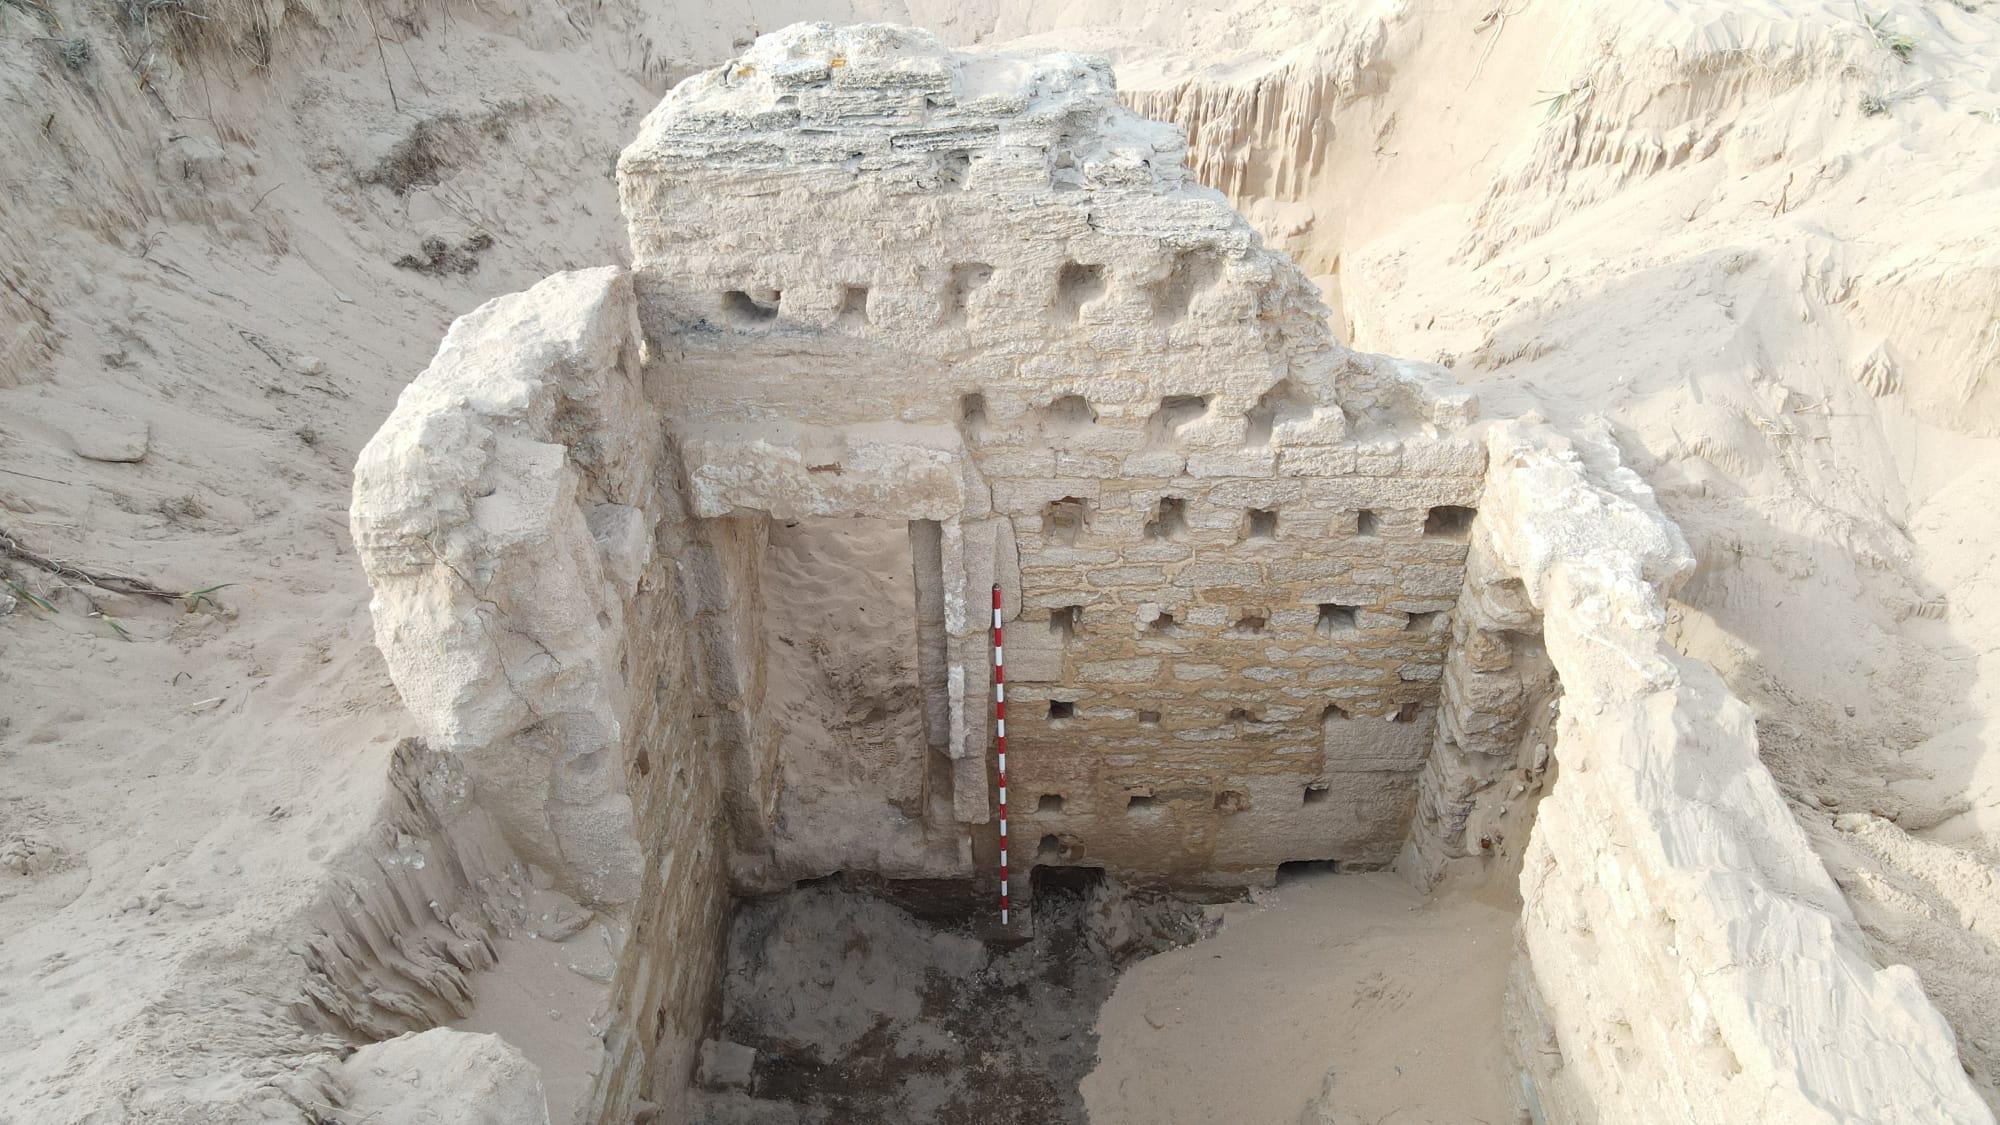 Roman bath complex emerges from Spanish sand dunes